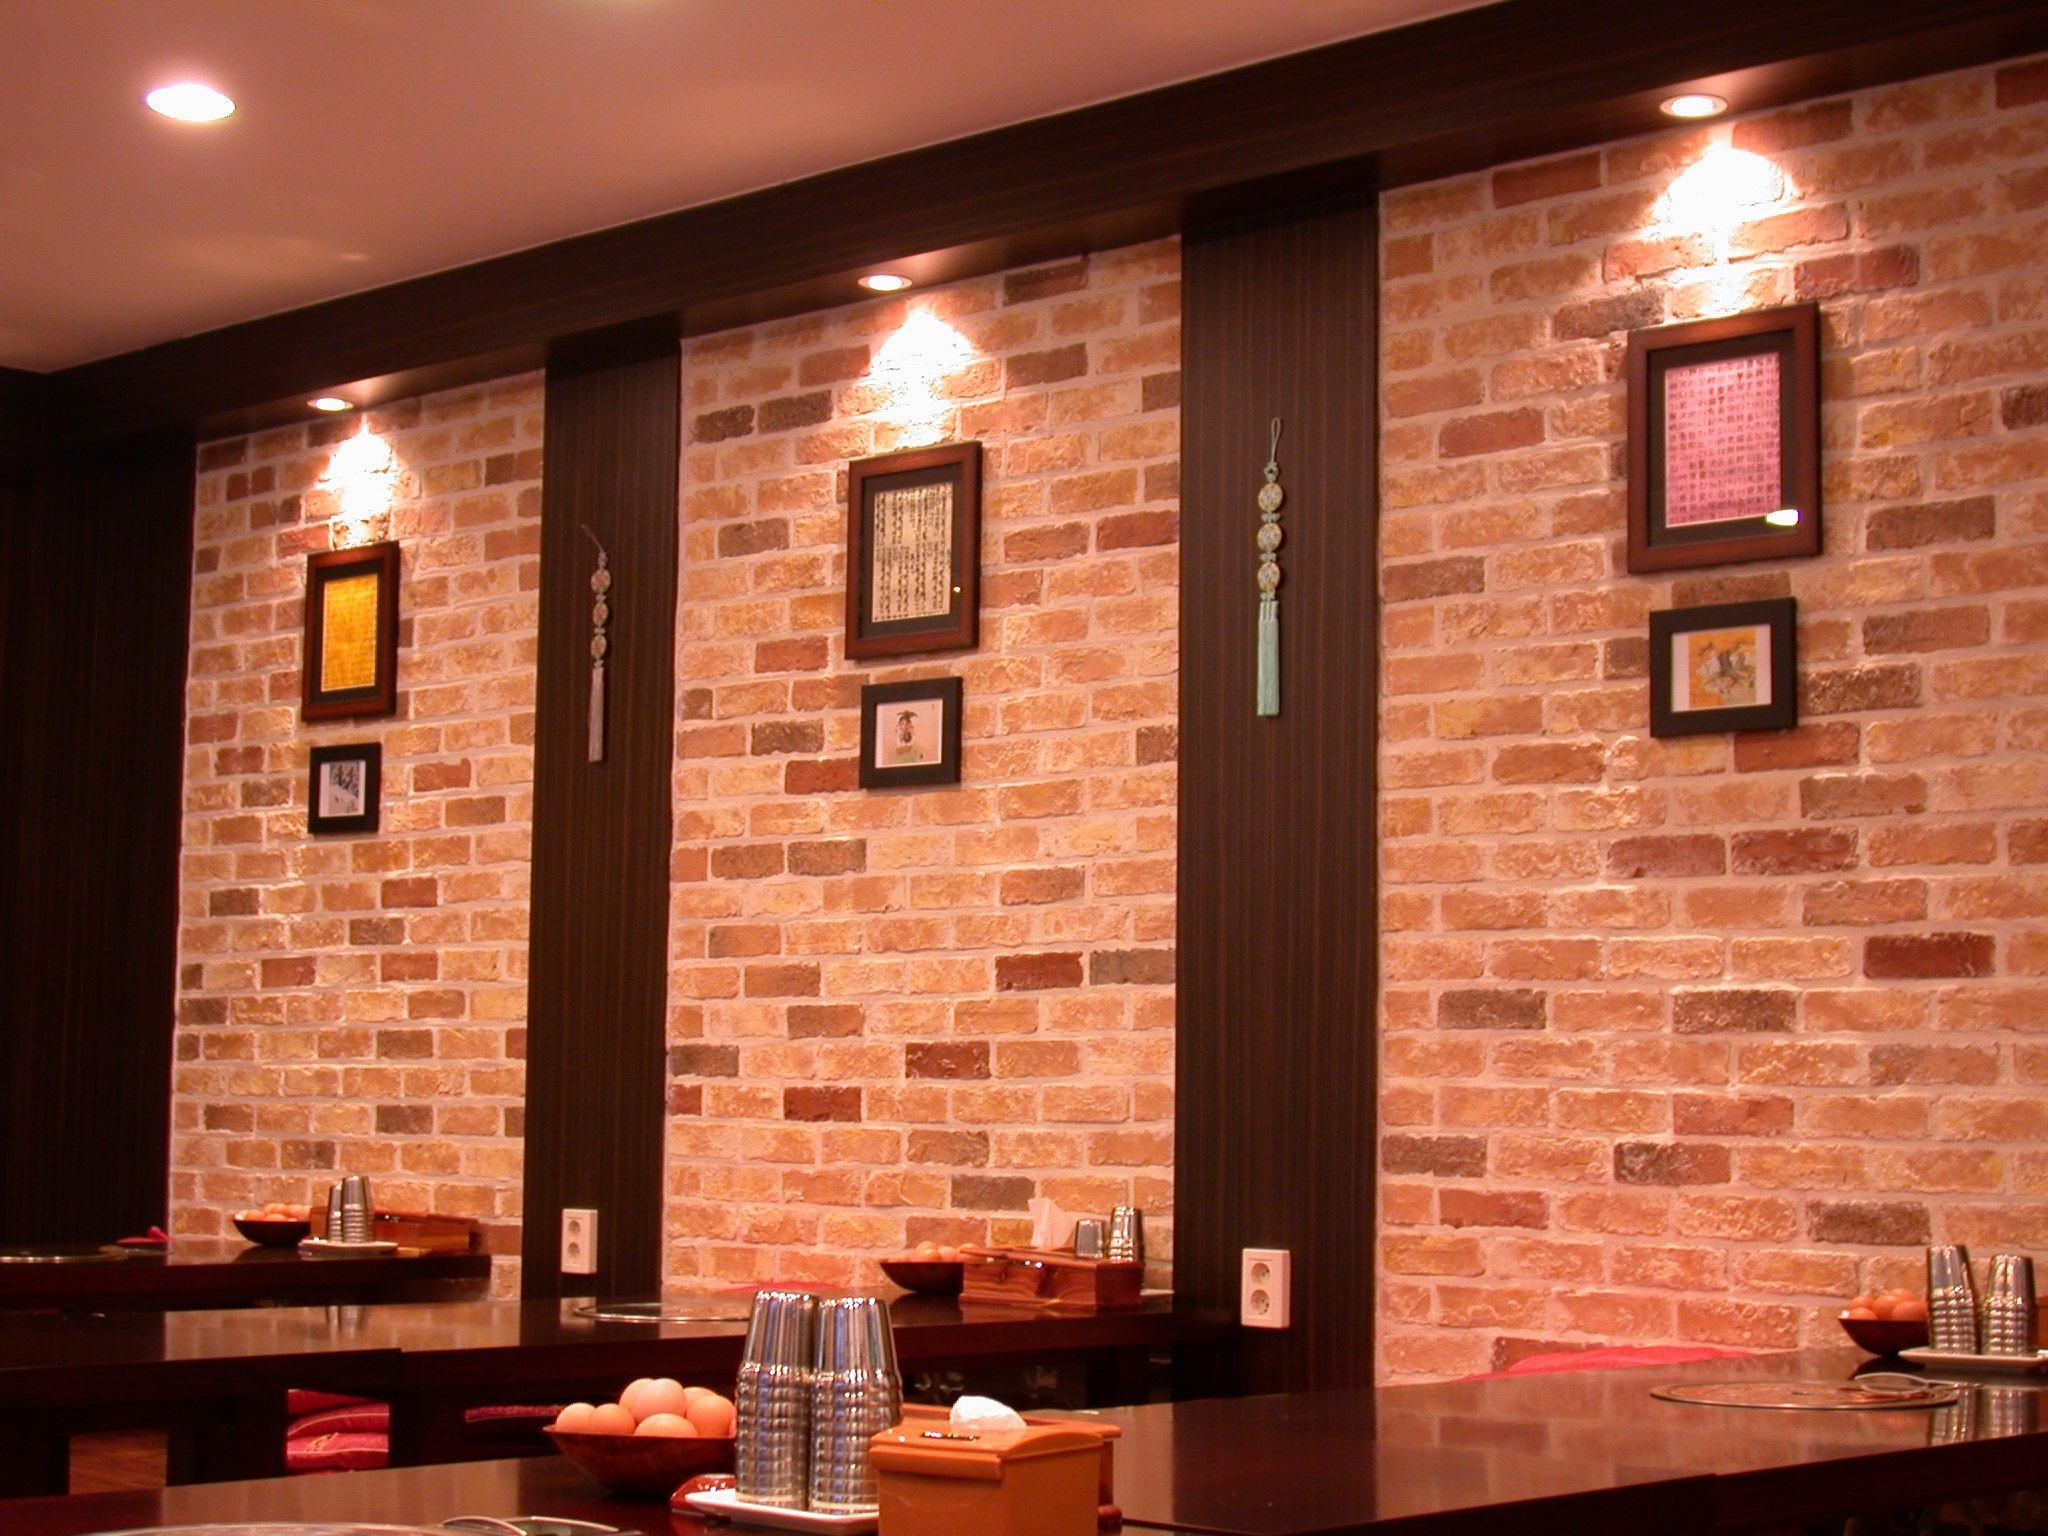 Brick Walls Decorating Ideas Exterior Interior Stunning Spotlight Ceiling  Lamp Decorate Wall Living Artdecors Brick Rustic Dining Areas Design Ideas  Stylish ...